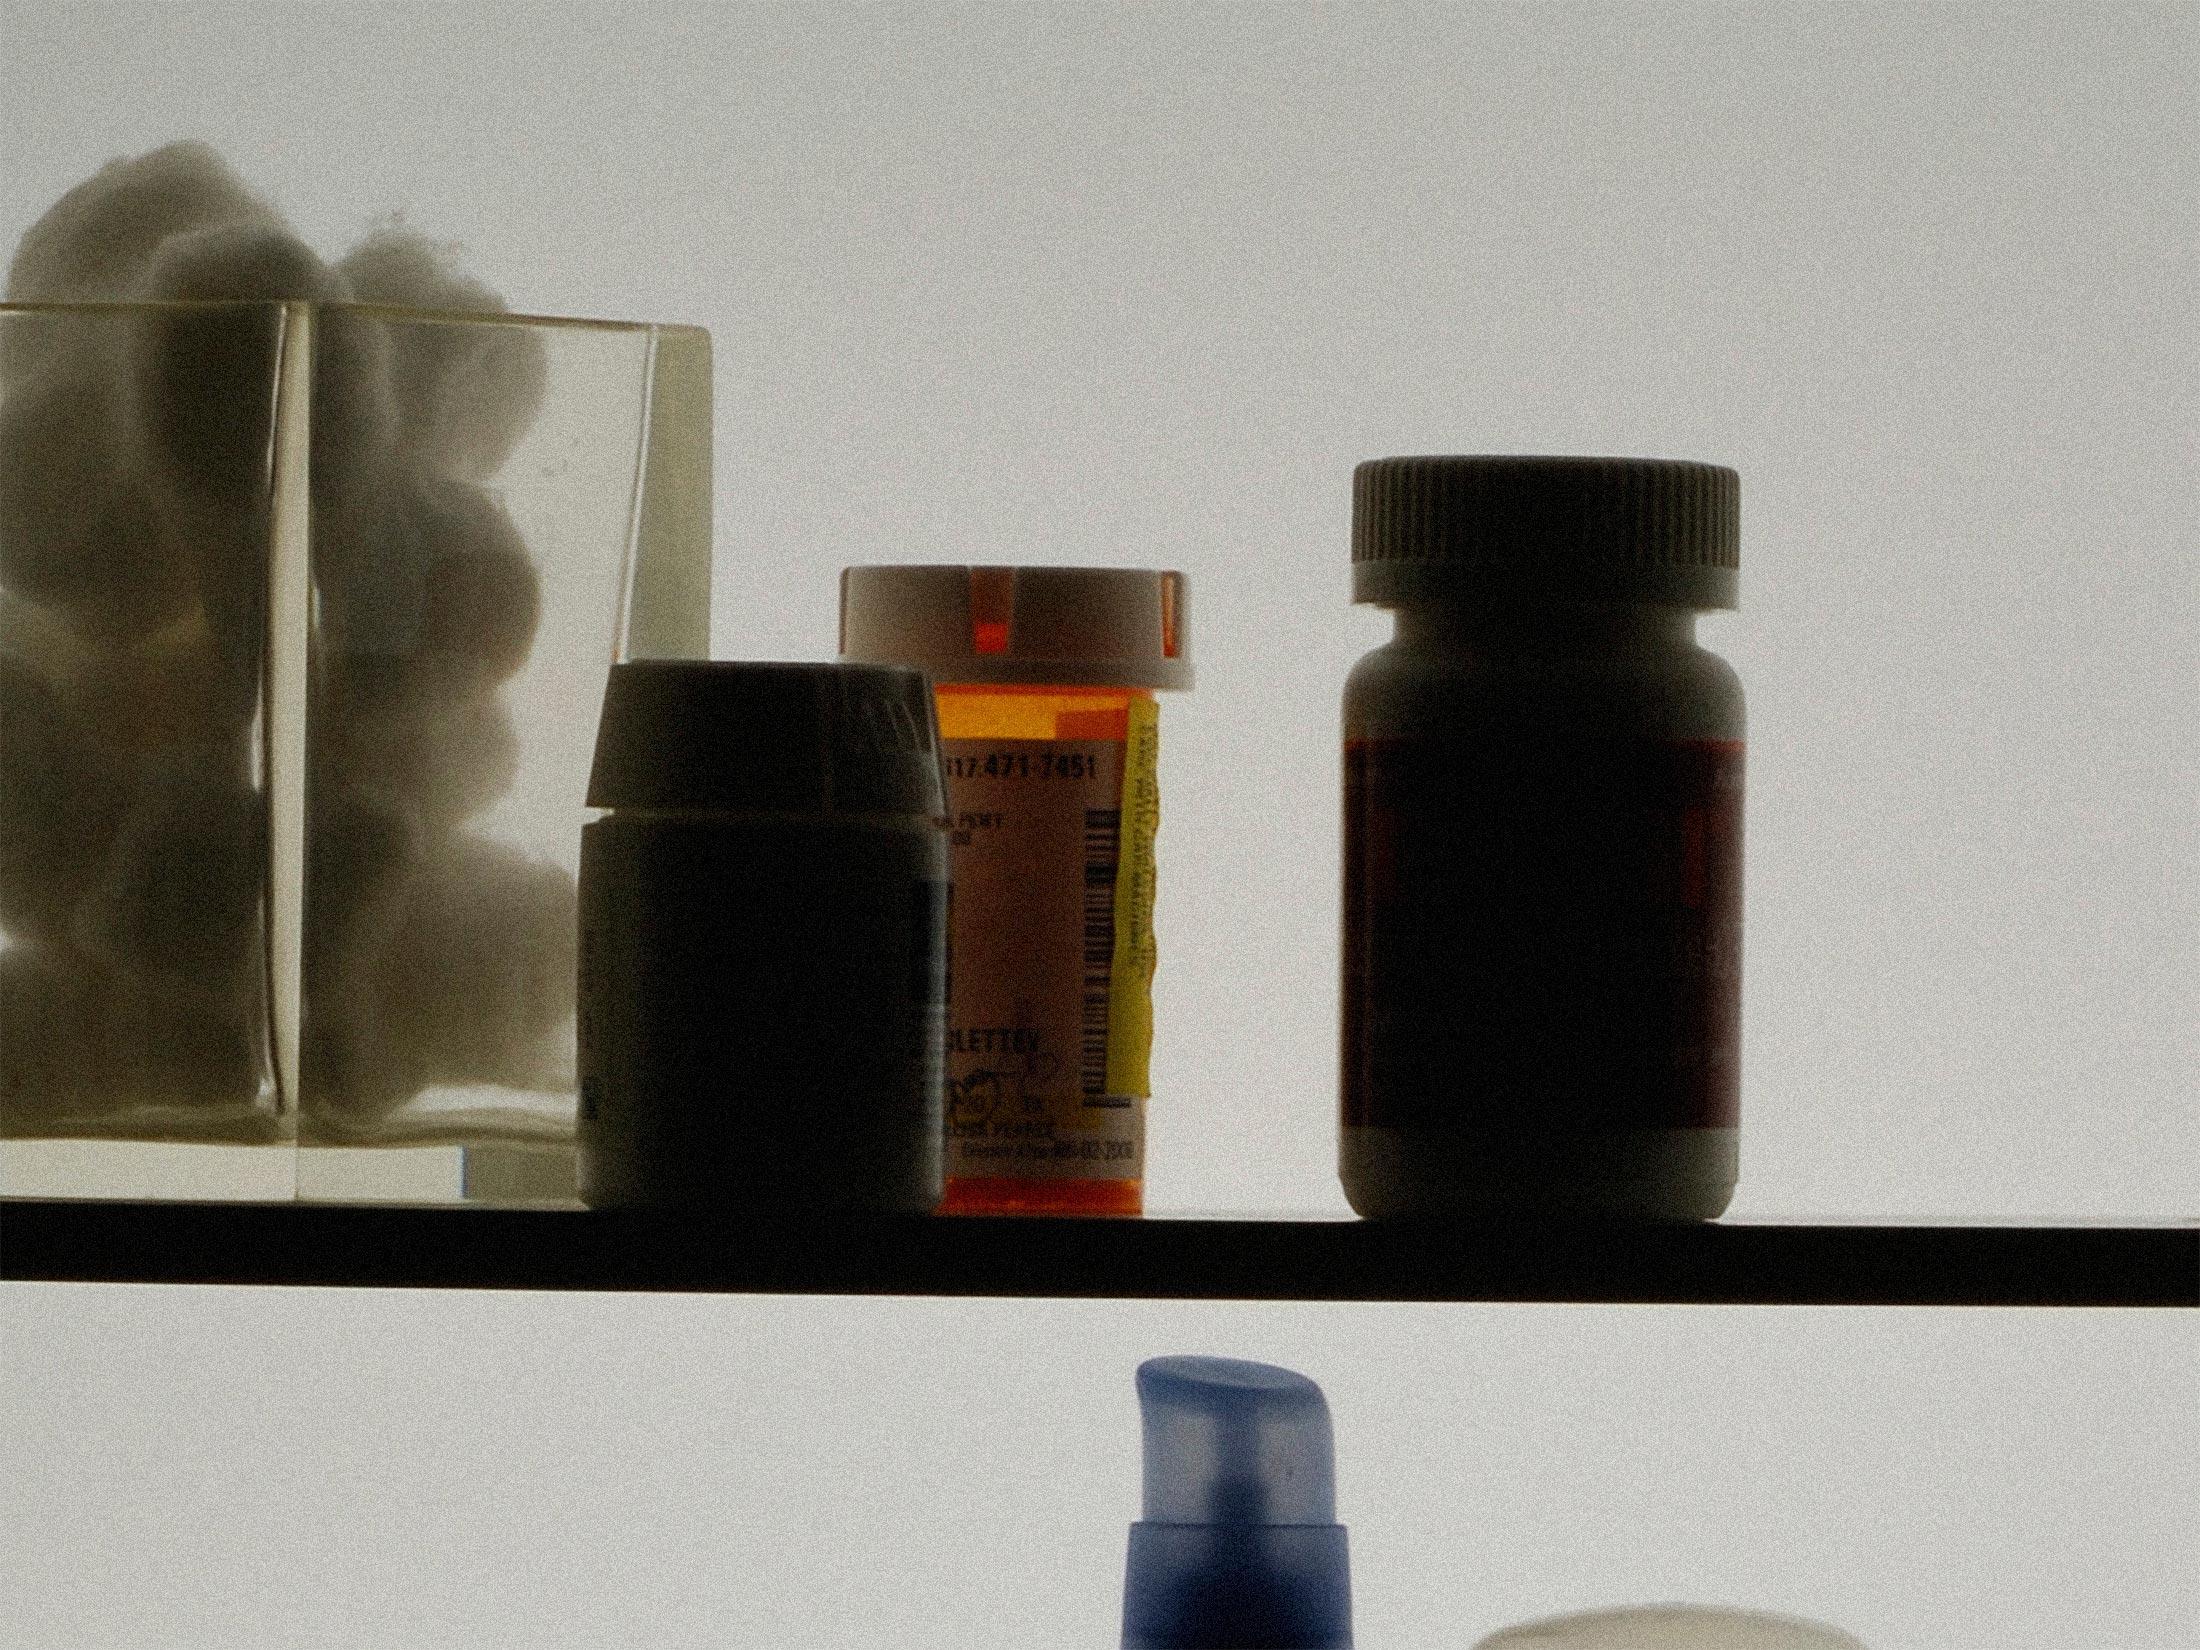 The FDA Drug Recall System is Voluntary, Haphazard, and Broken